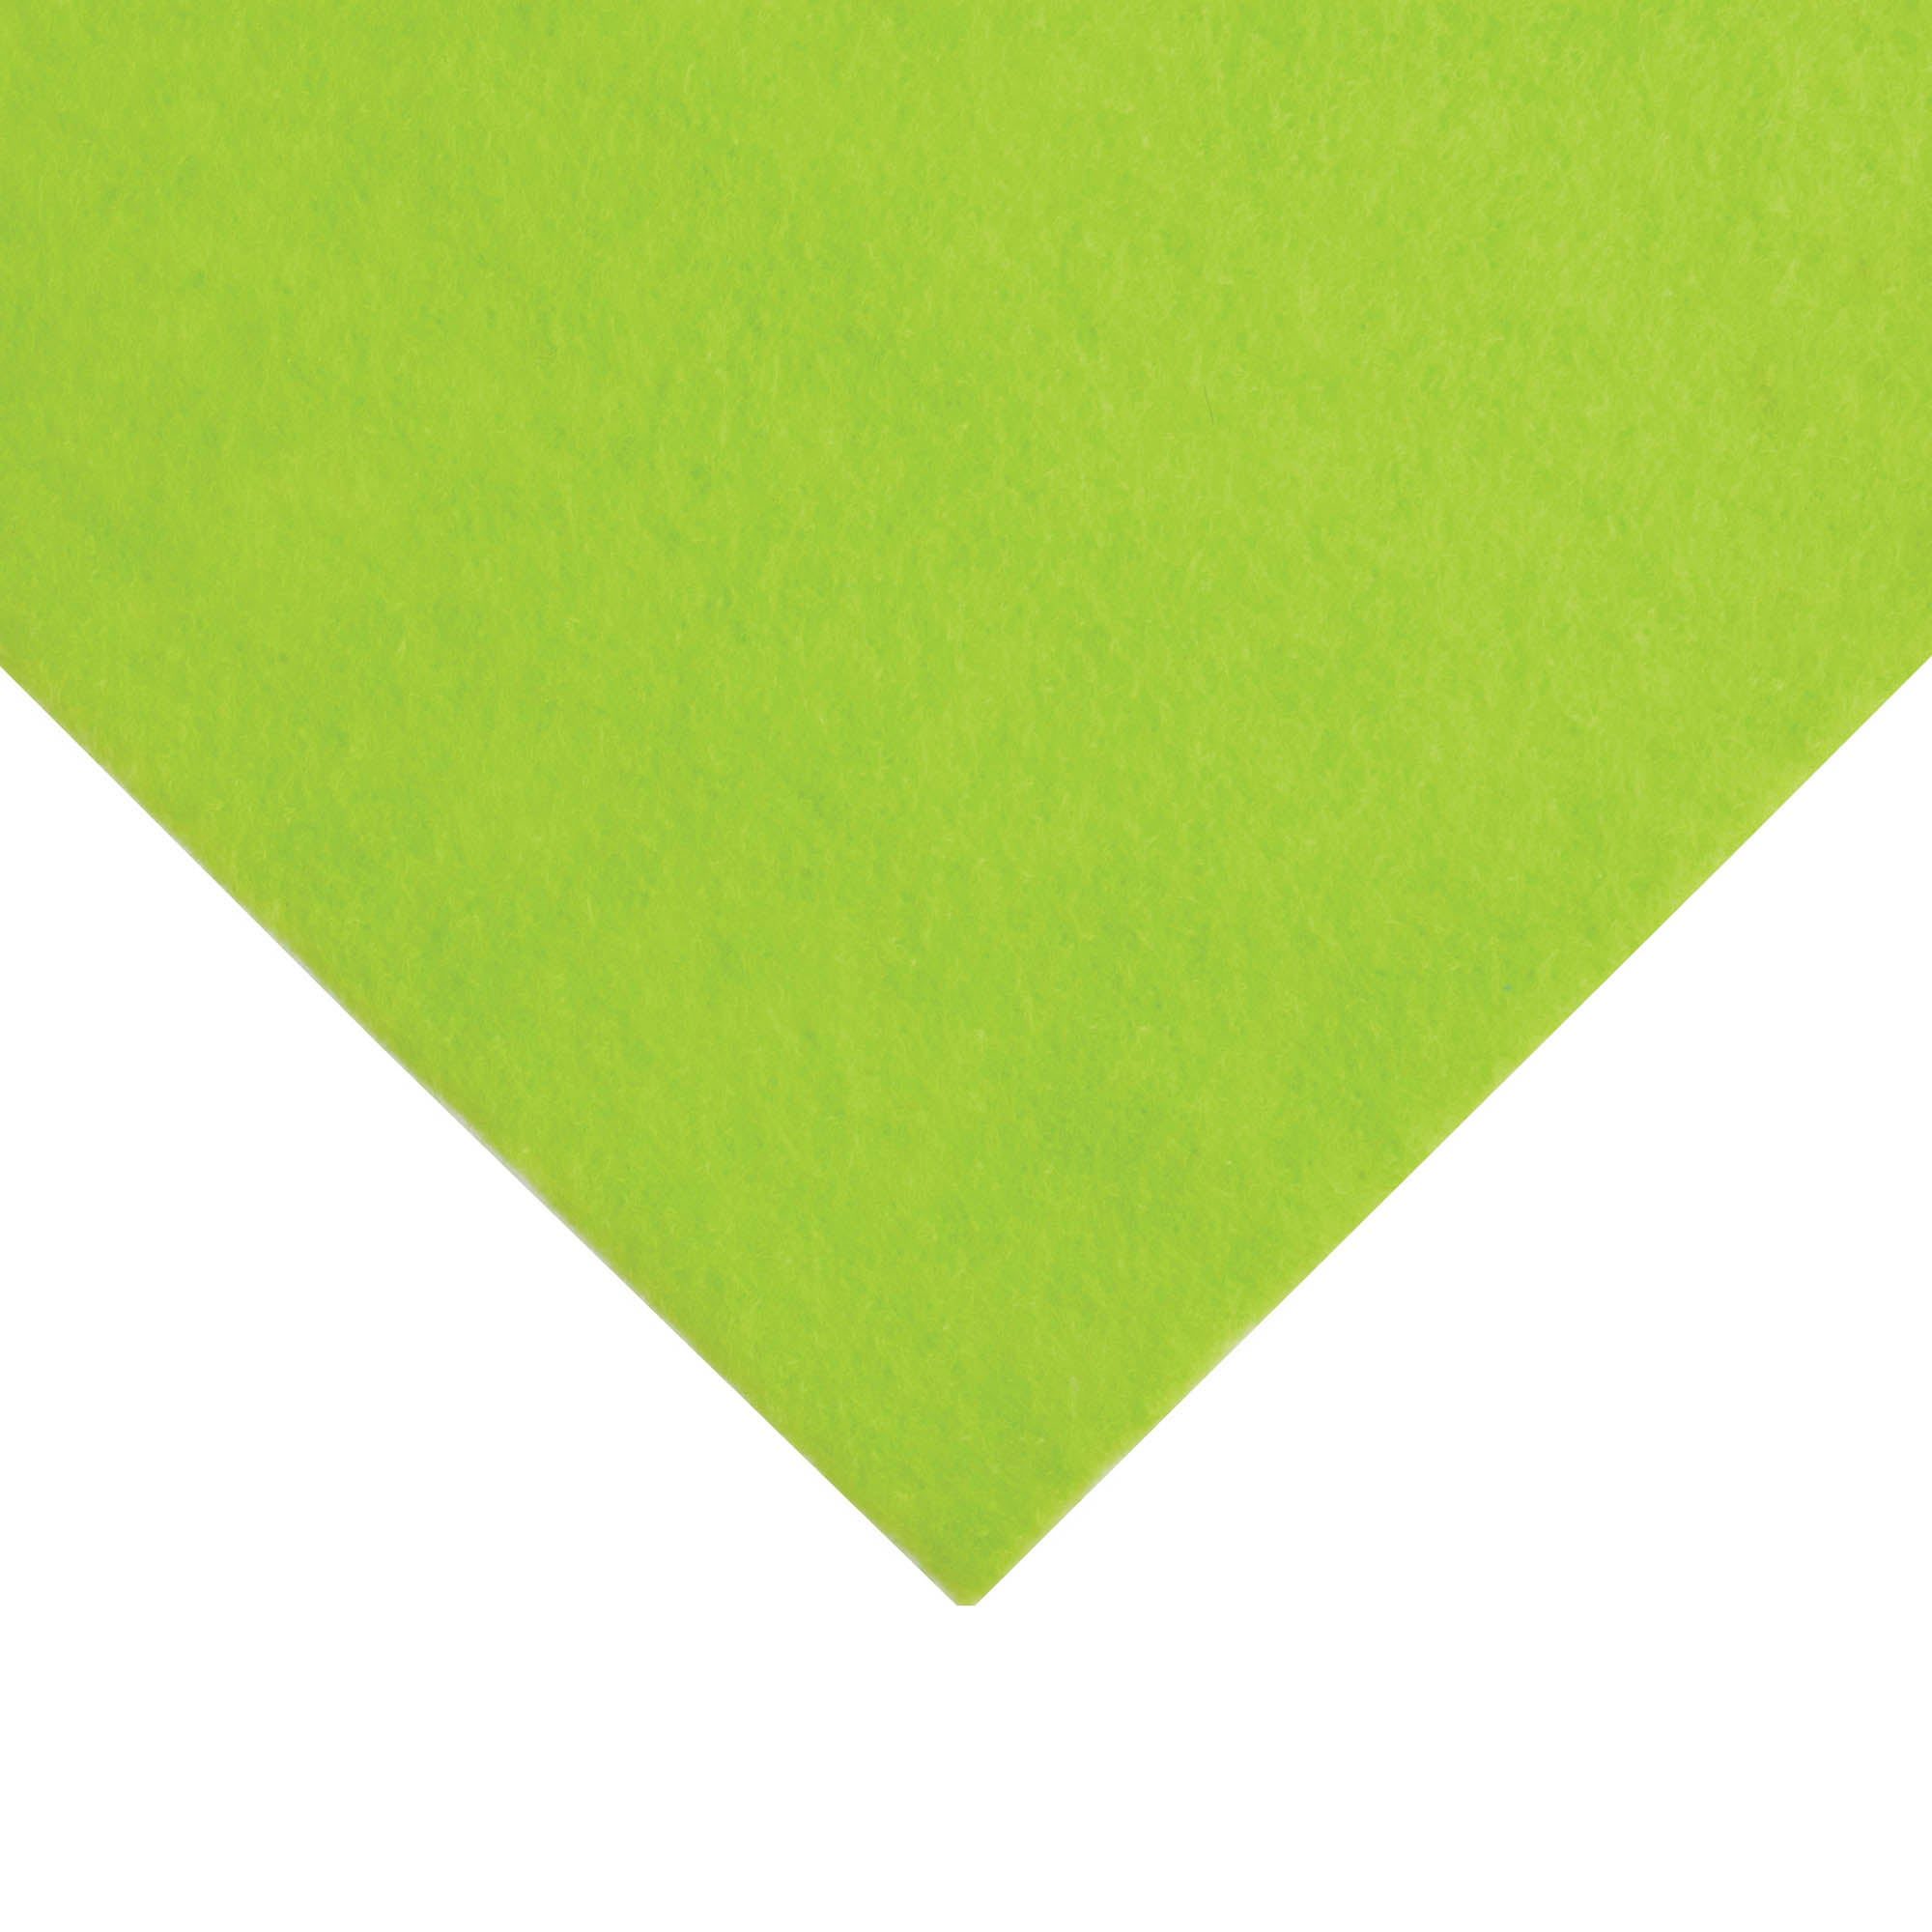 Photo of Minicraft felt roll lime -green-